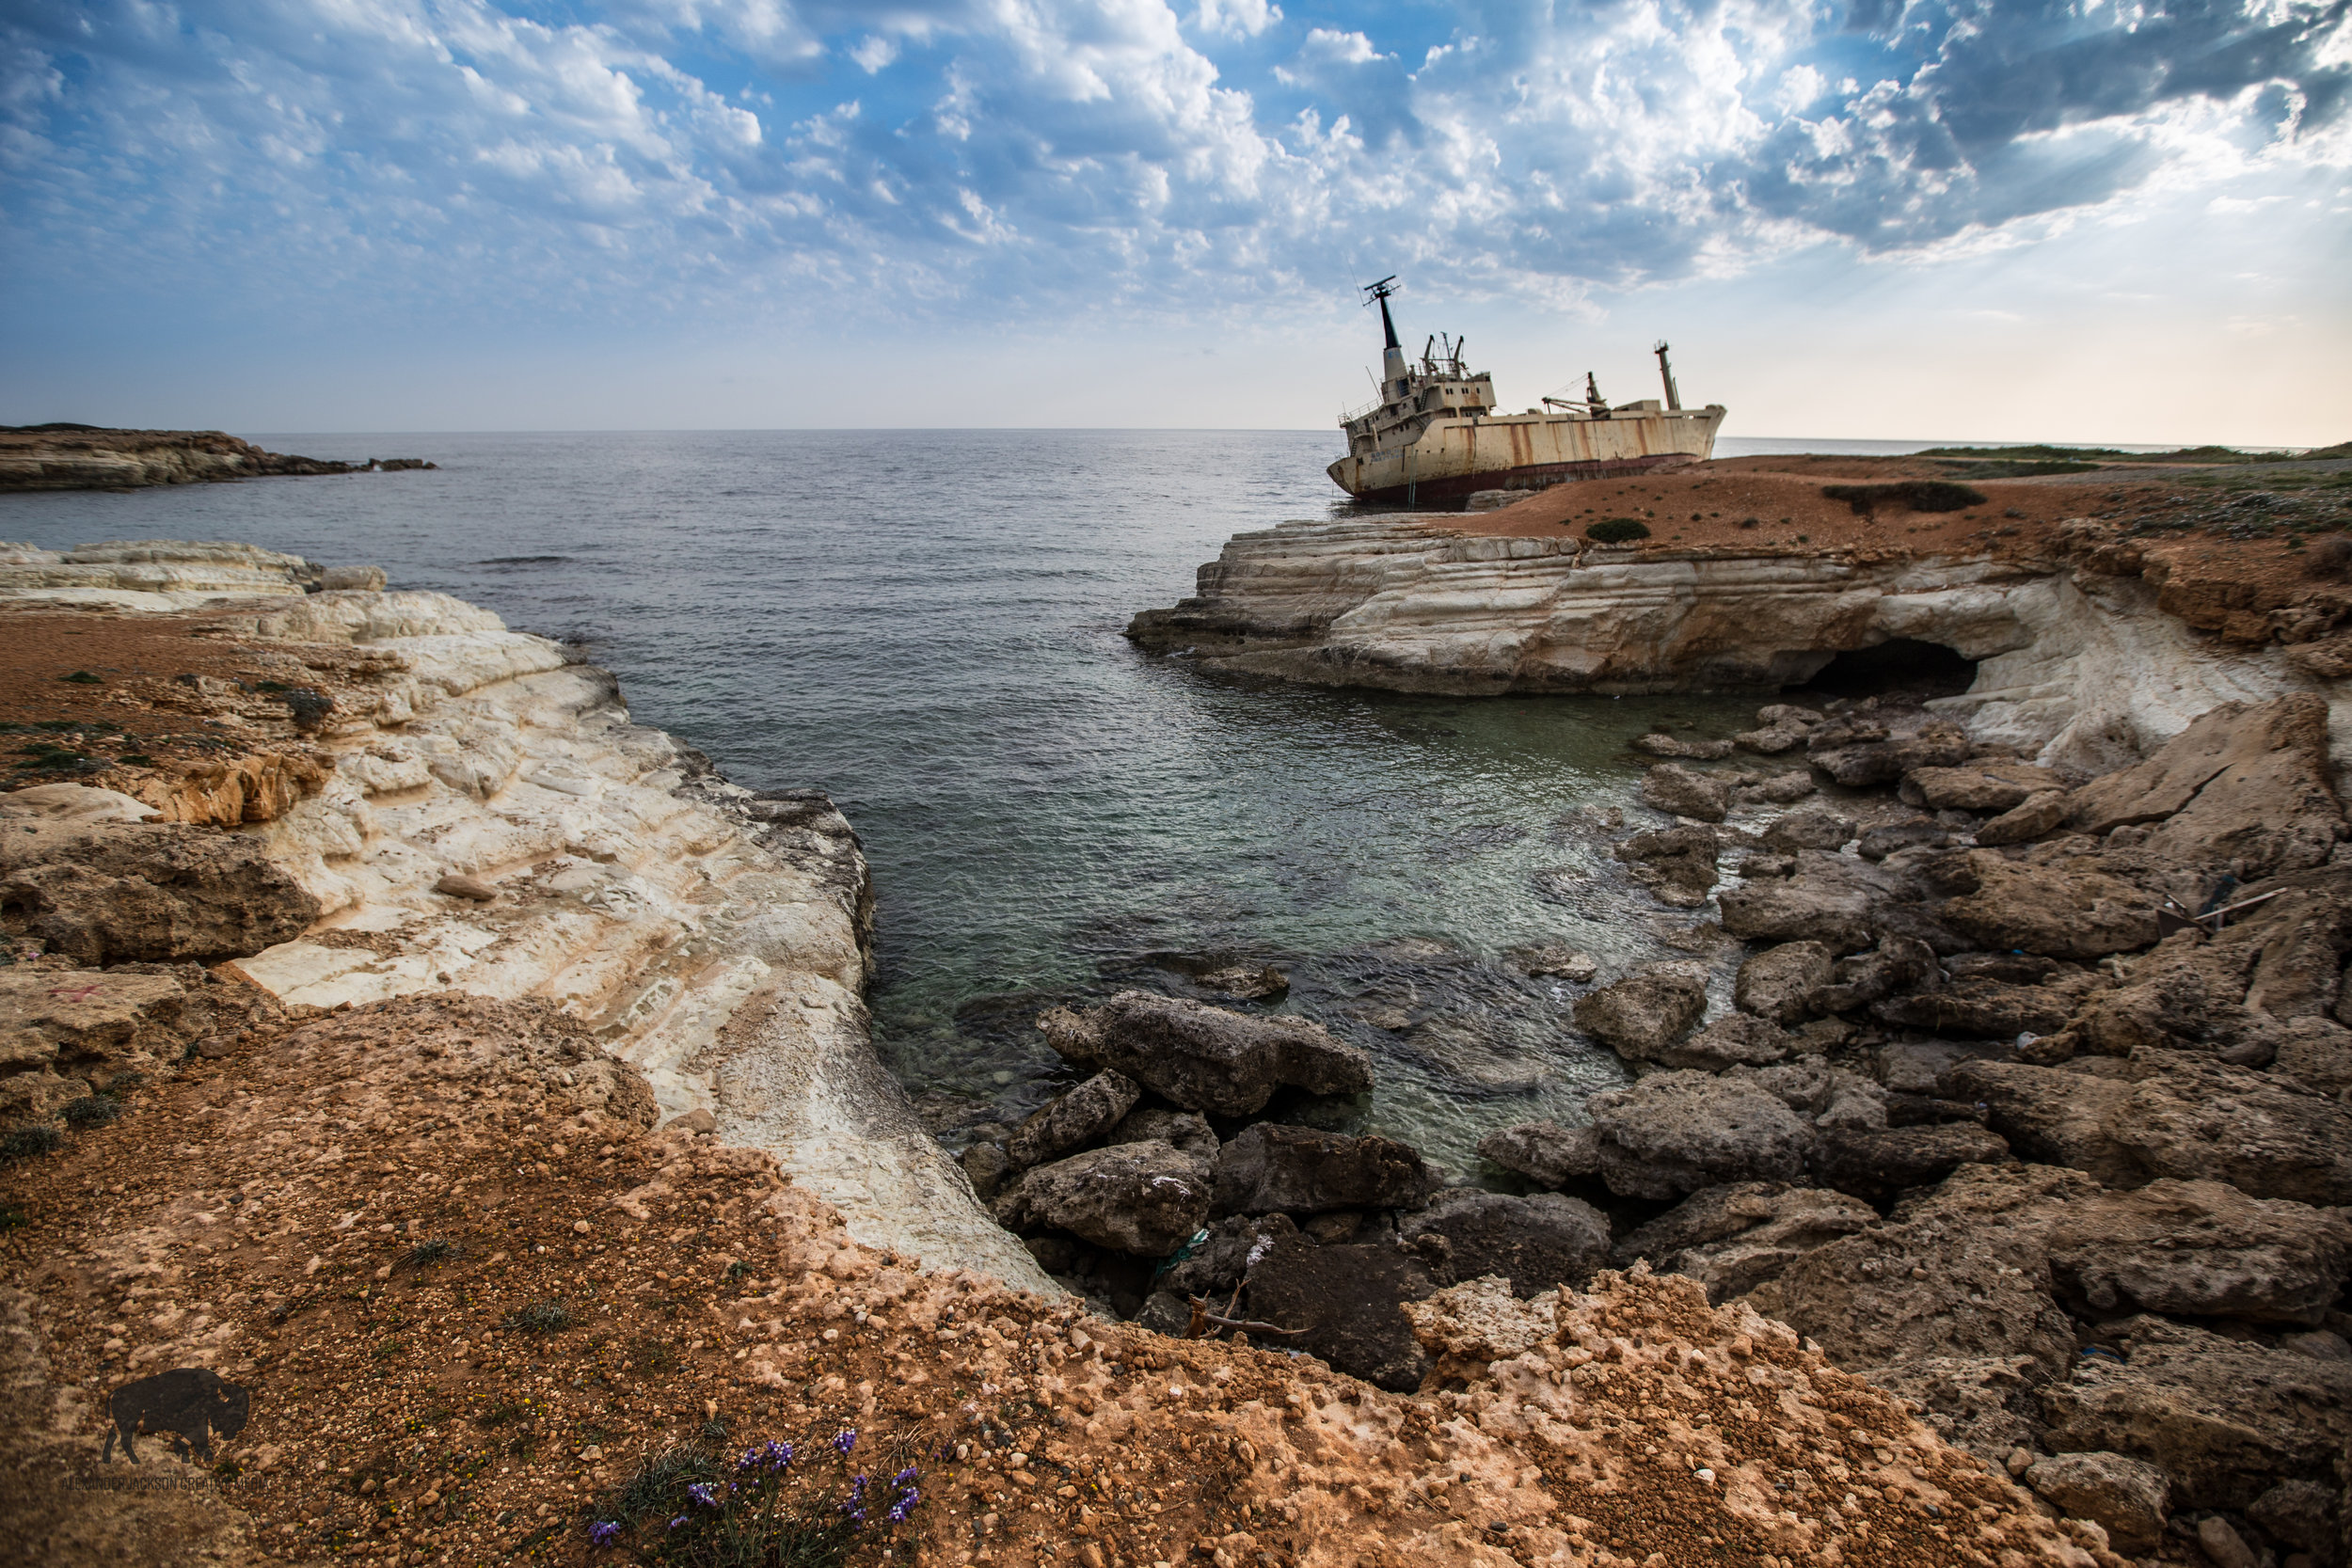 Sunsets, sea caves and shipwrecks.